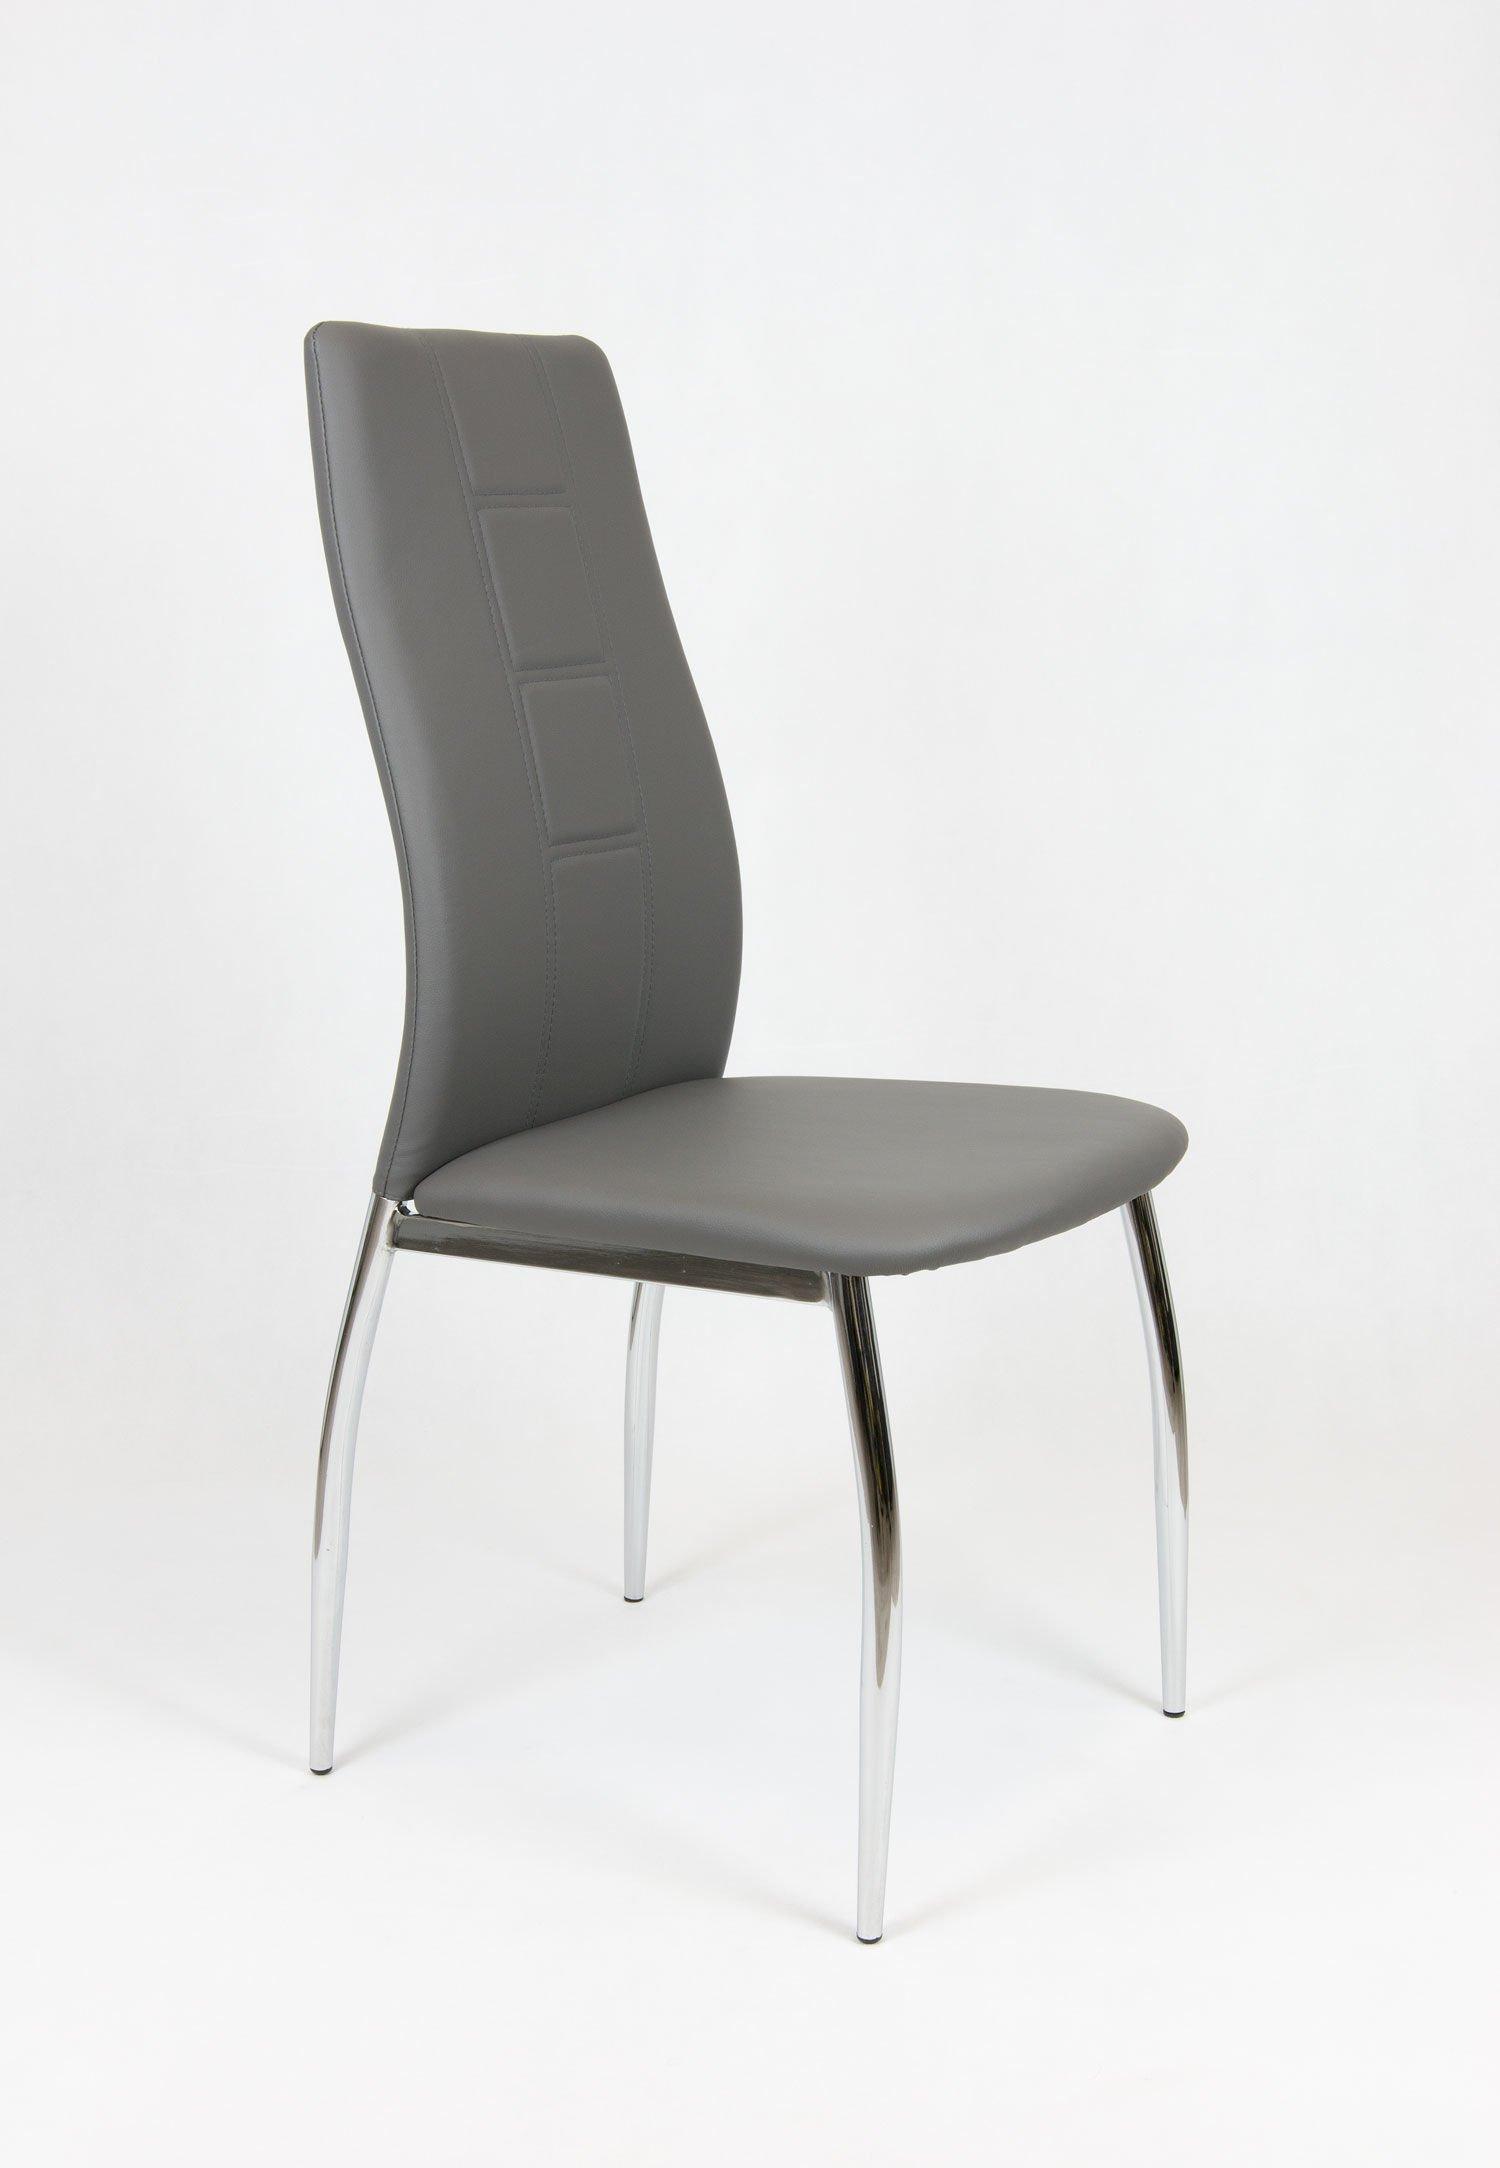 Sk design ks026 grau kunsleder stuhl mit chromgestell grau for Design stuhl grau